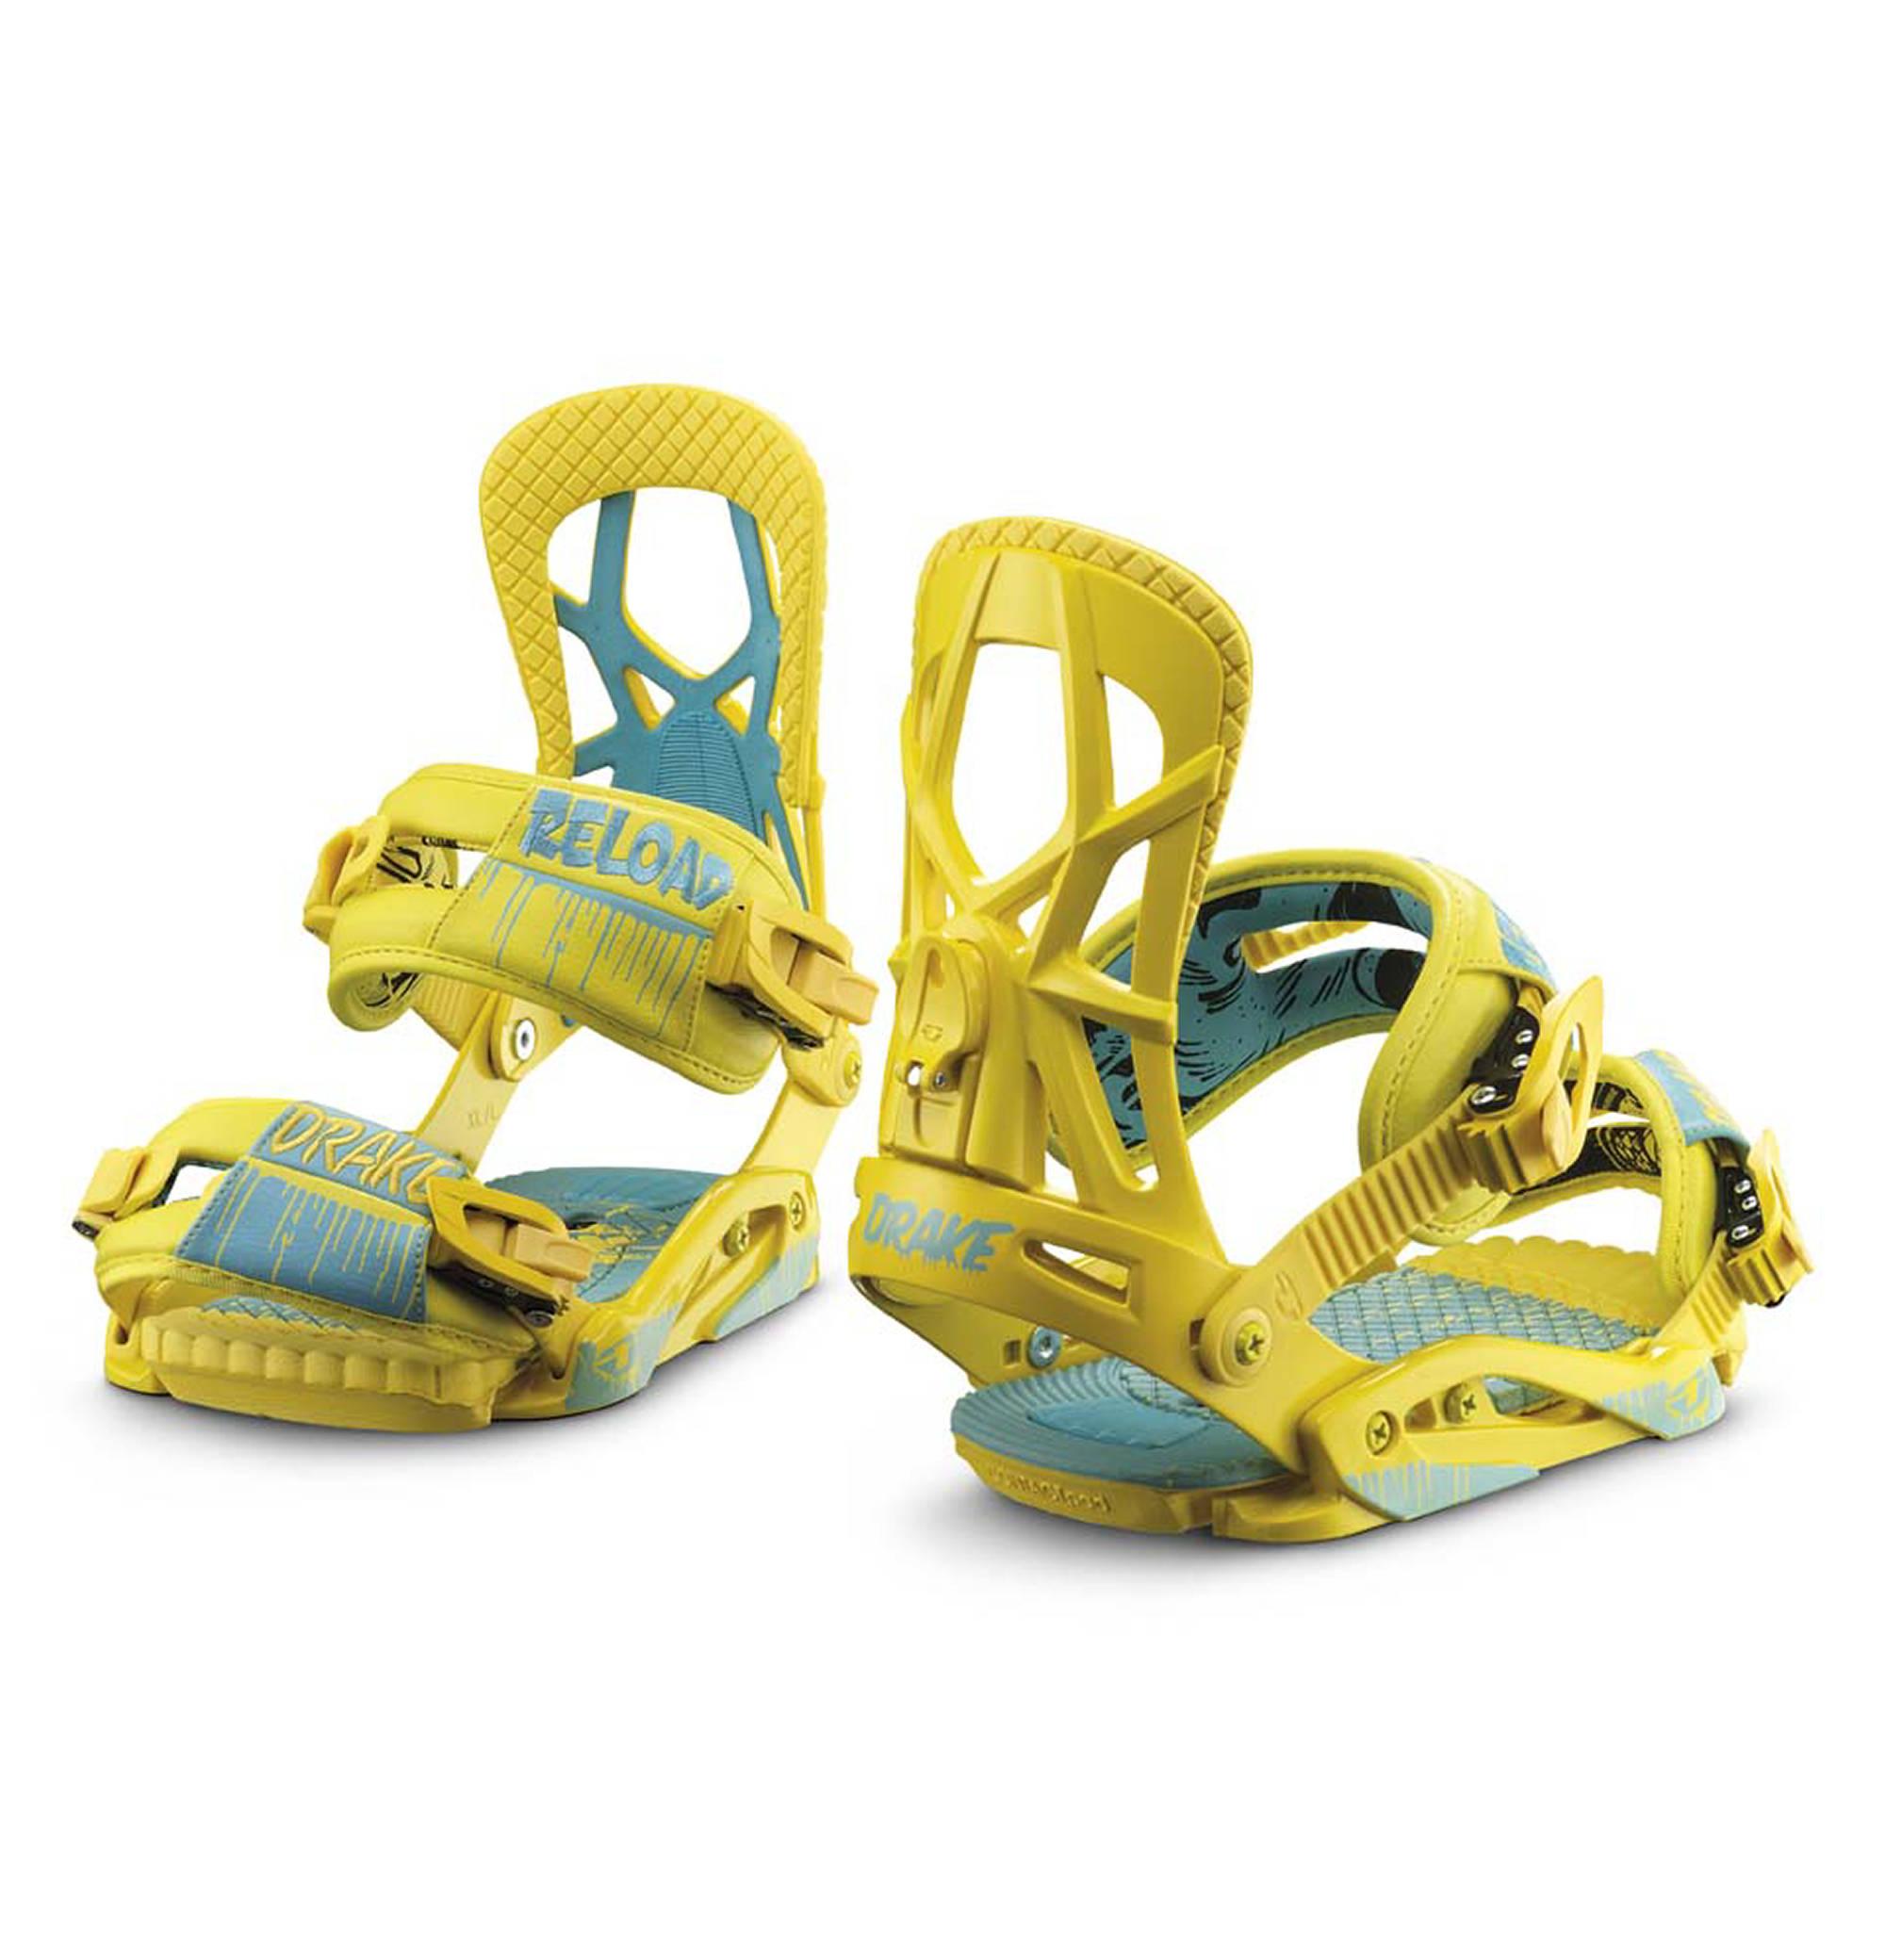 Drake Reload Snowboard Bindings In Yellow